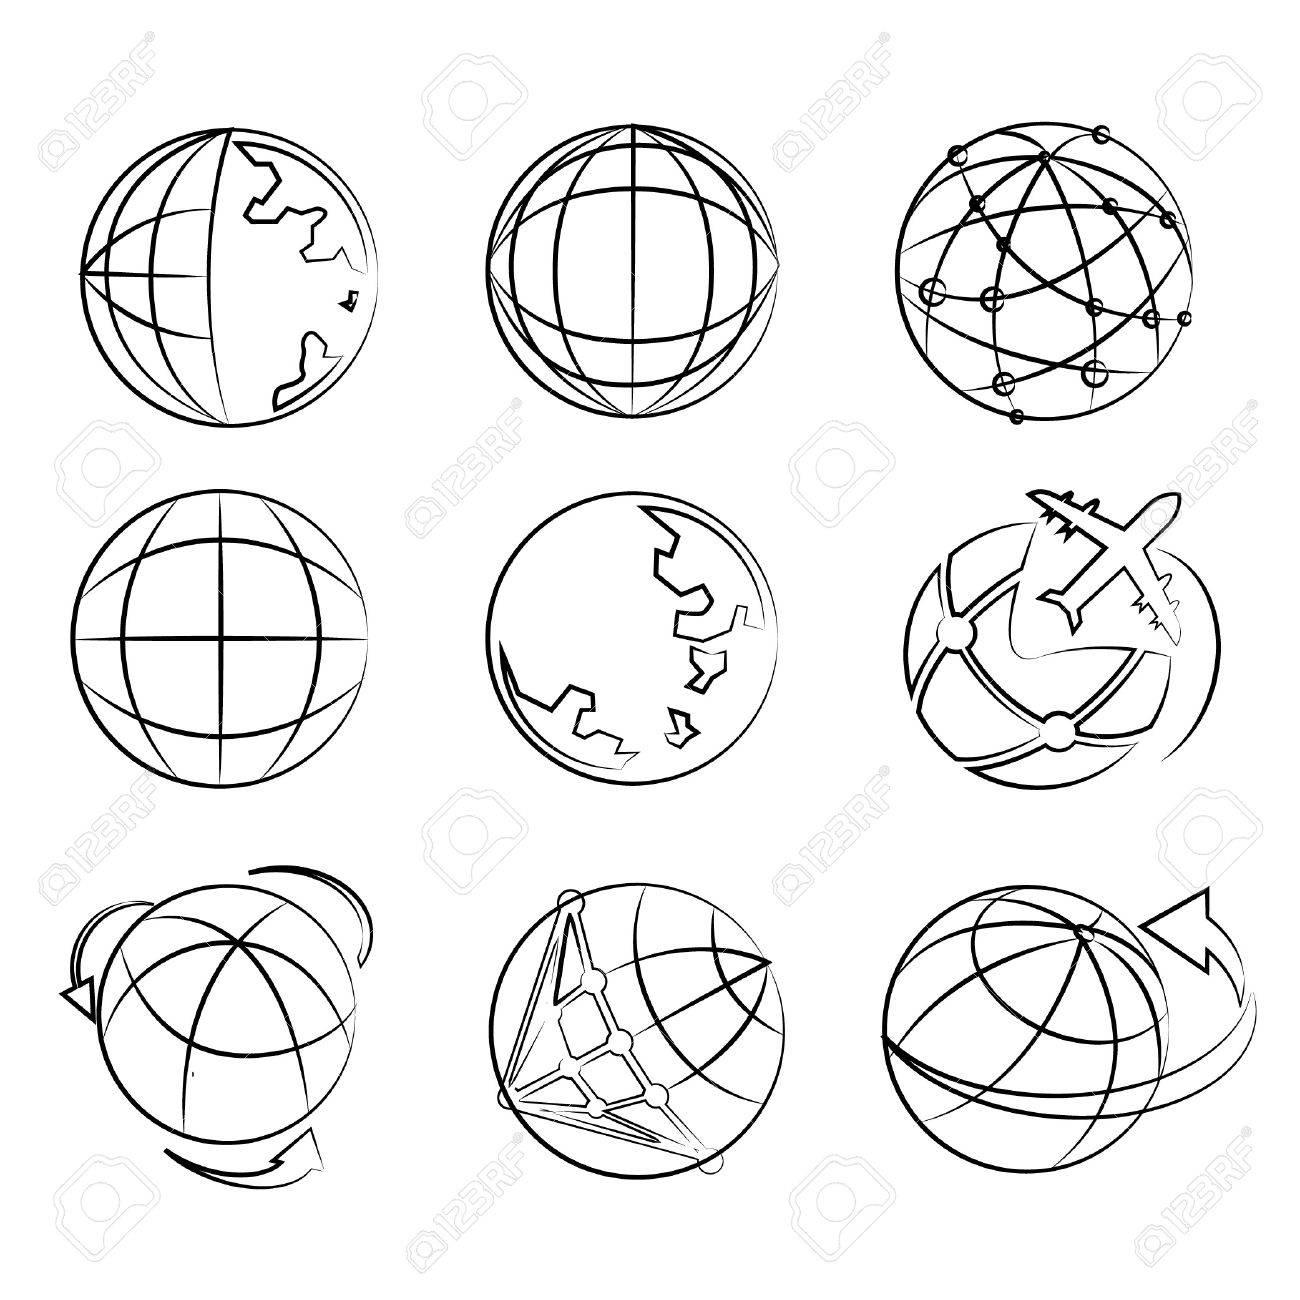 1300x1300 Globe Drawing Line Set, World Map Sketch Line Royalty Free